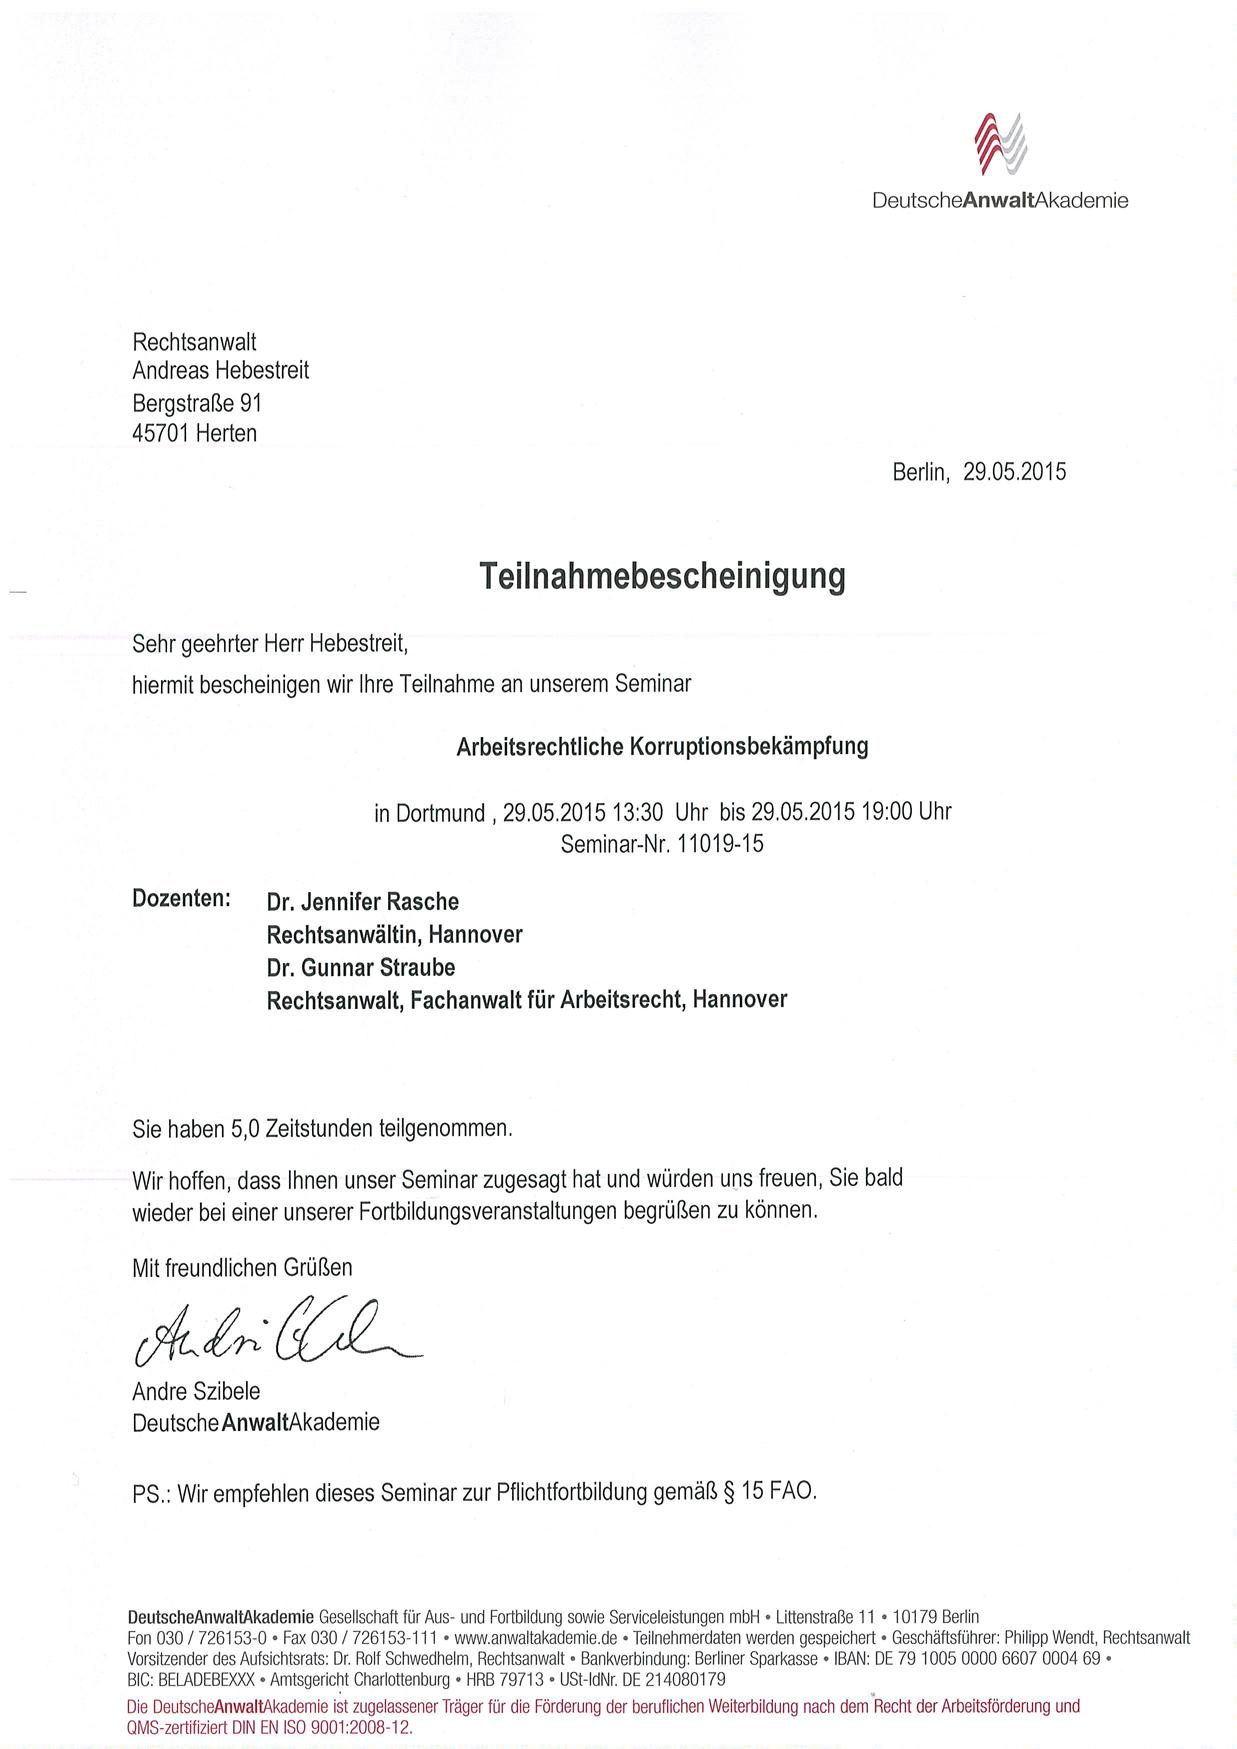 Fortbildungsbescheinigung Rechtsanwalt Andreas Hebestreit